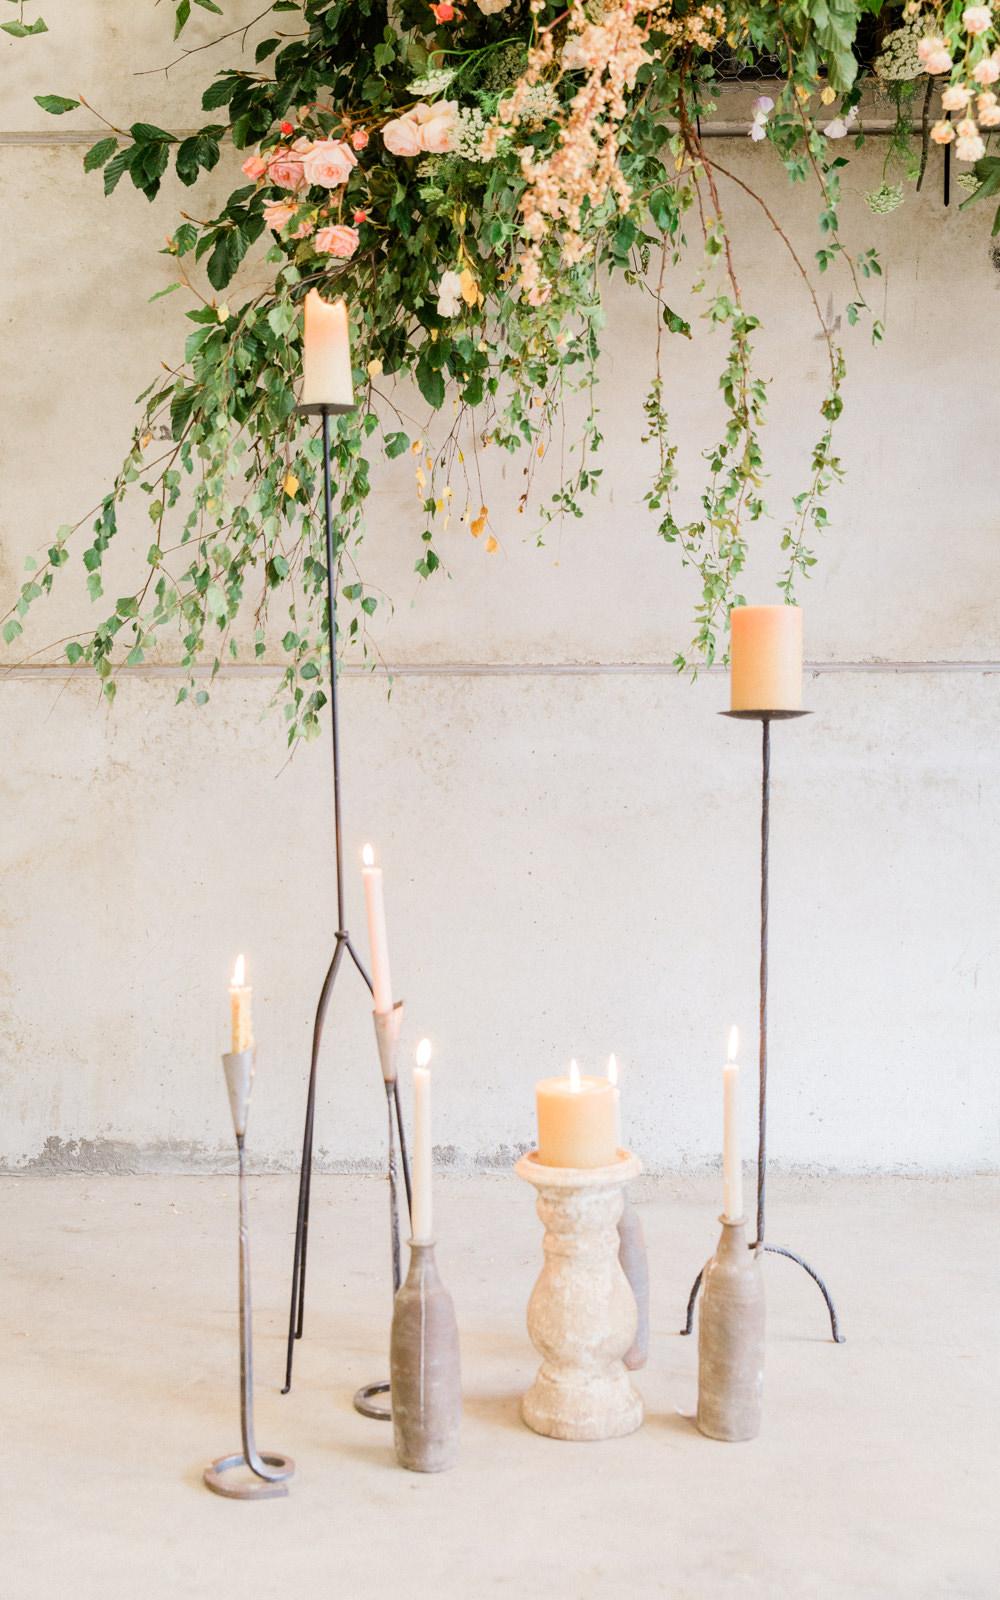 Candles Flowers Decor Tall Pillar Fine Art Farm Wedding Ideas Seyi Rochelle Photography